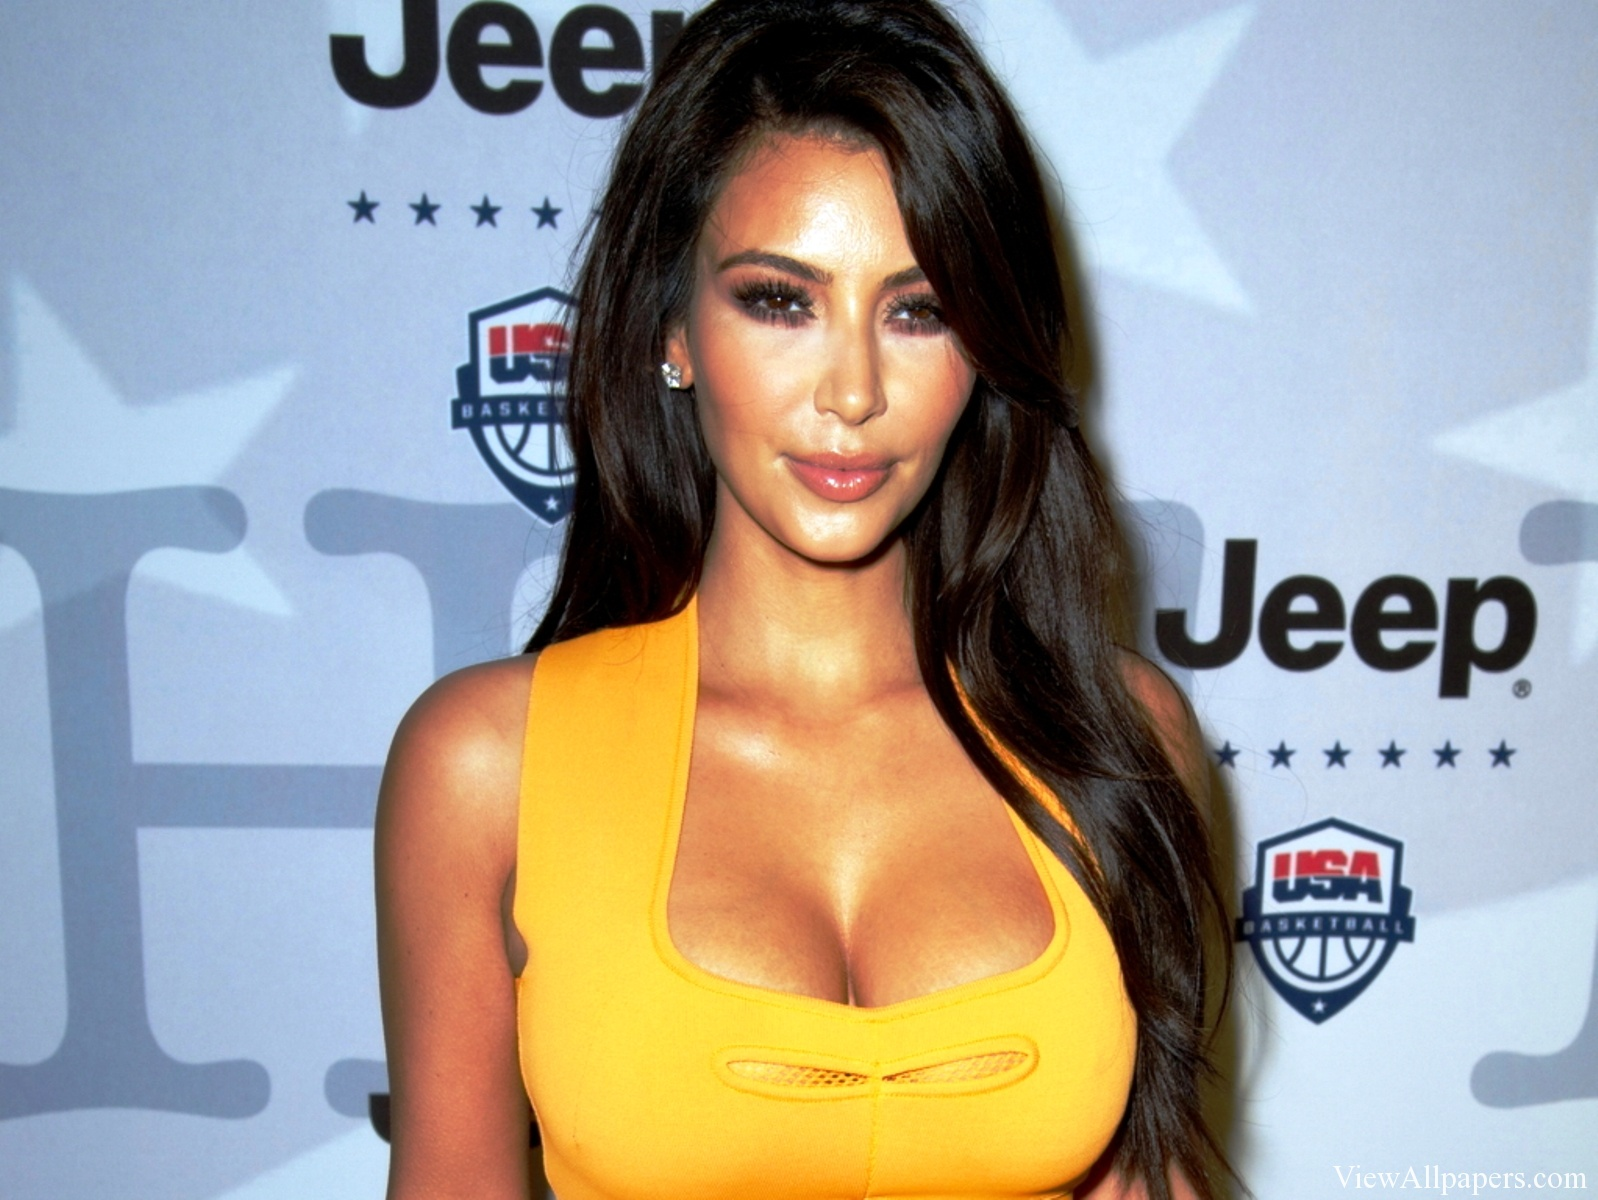 Kim Kardashian 2014 HD Wallpaper Female Celebrities HD Wallpapers 1598x1200